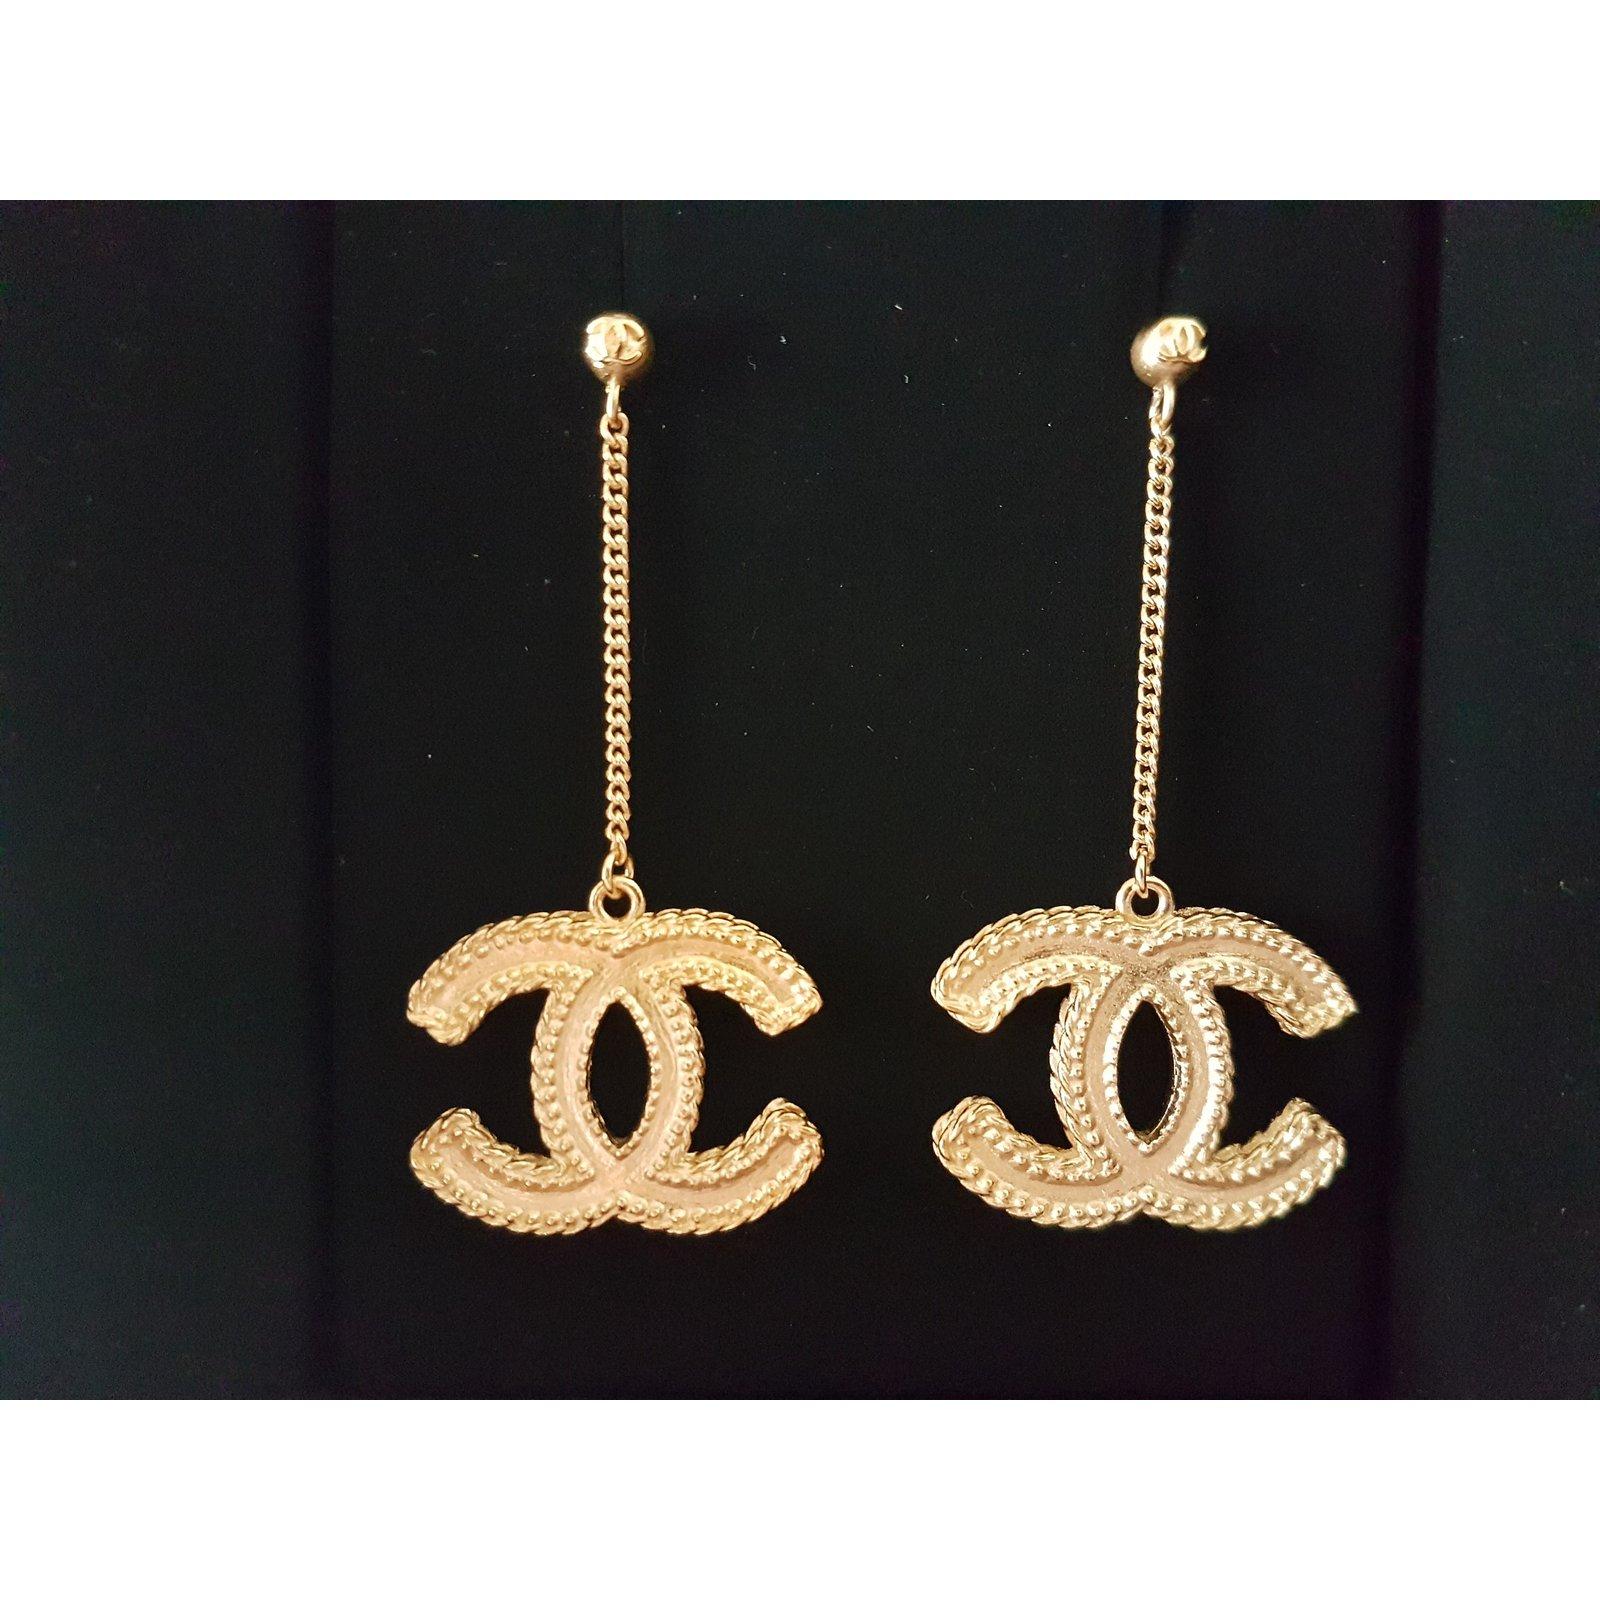 chanel earrings 2017 collection unworn earrings other